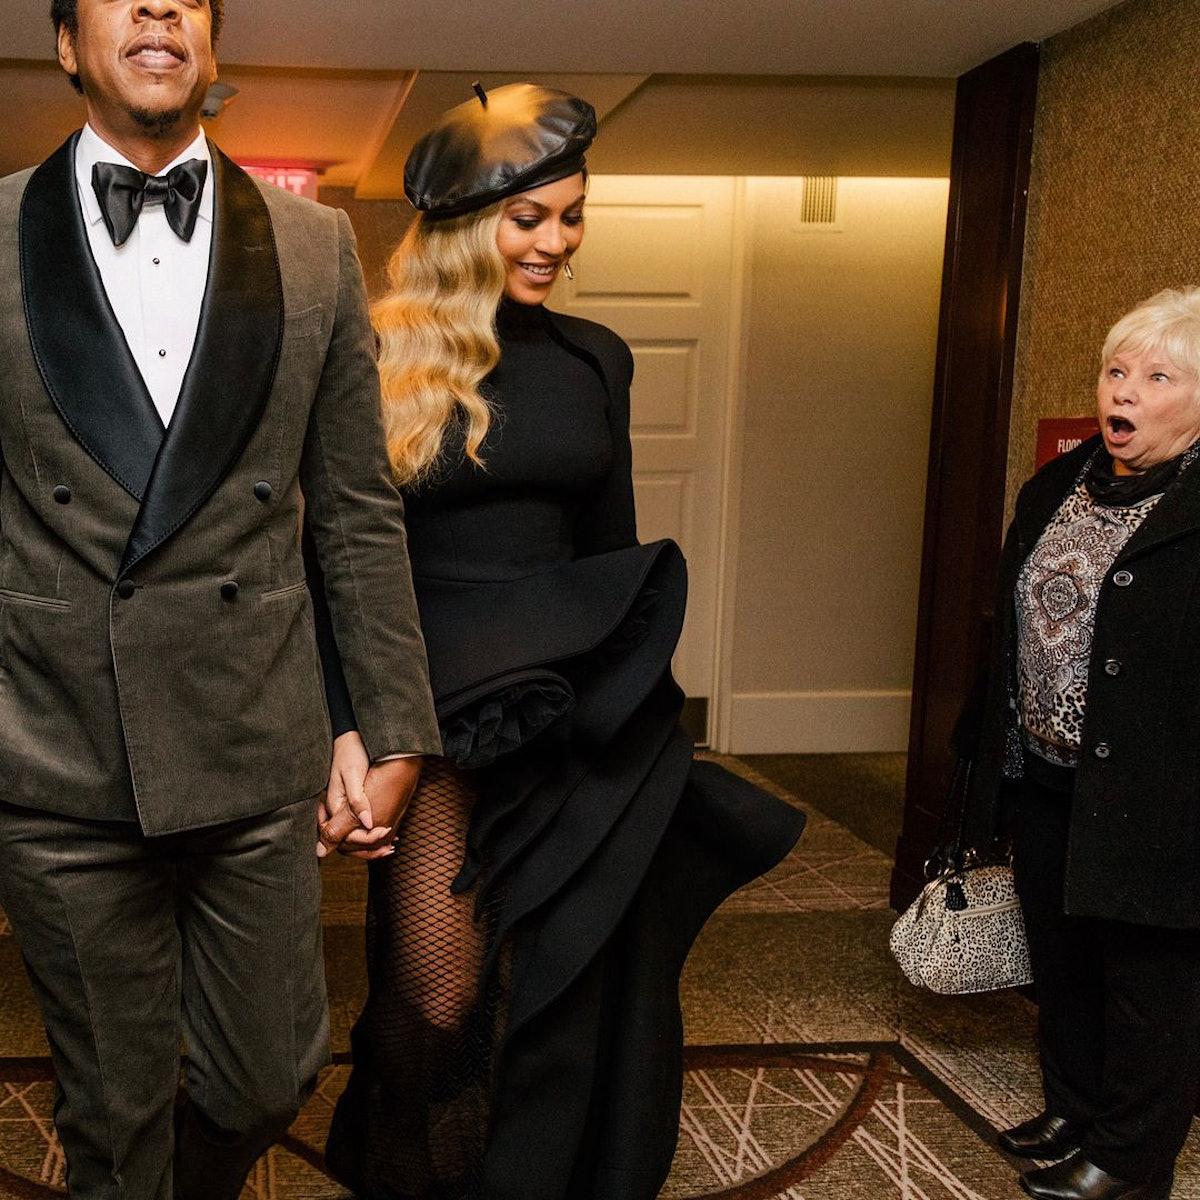 A woman gaping at Beyoncé and Jay-Z